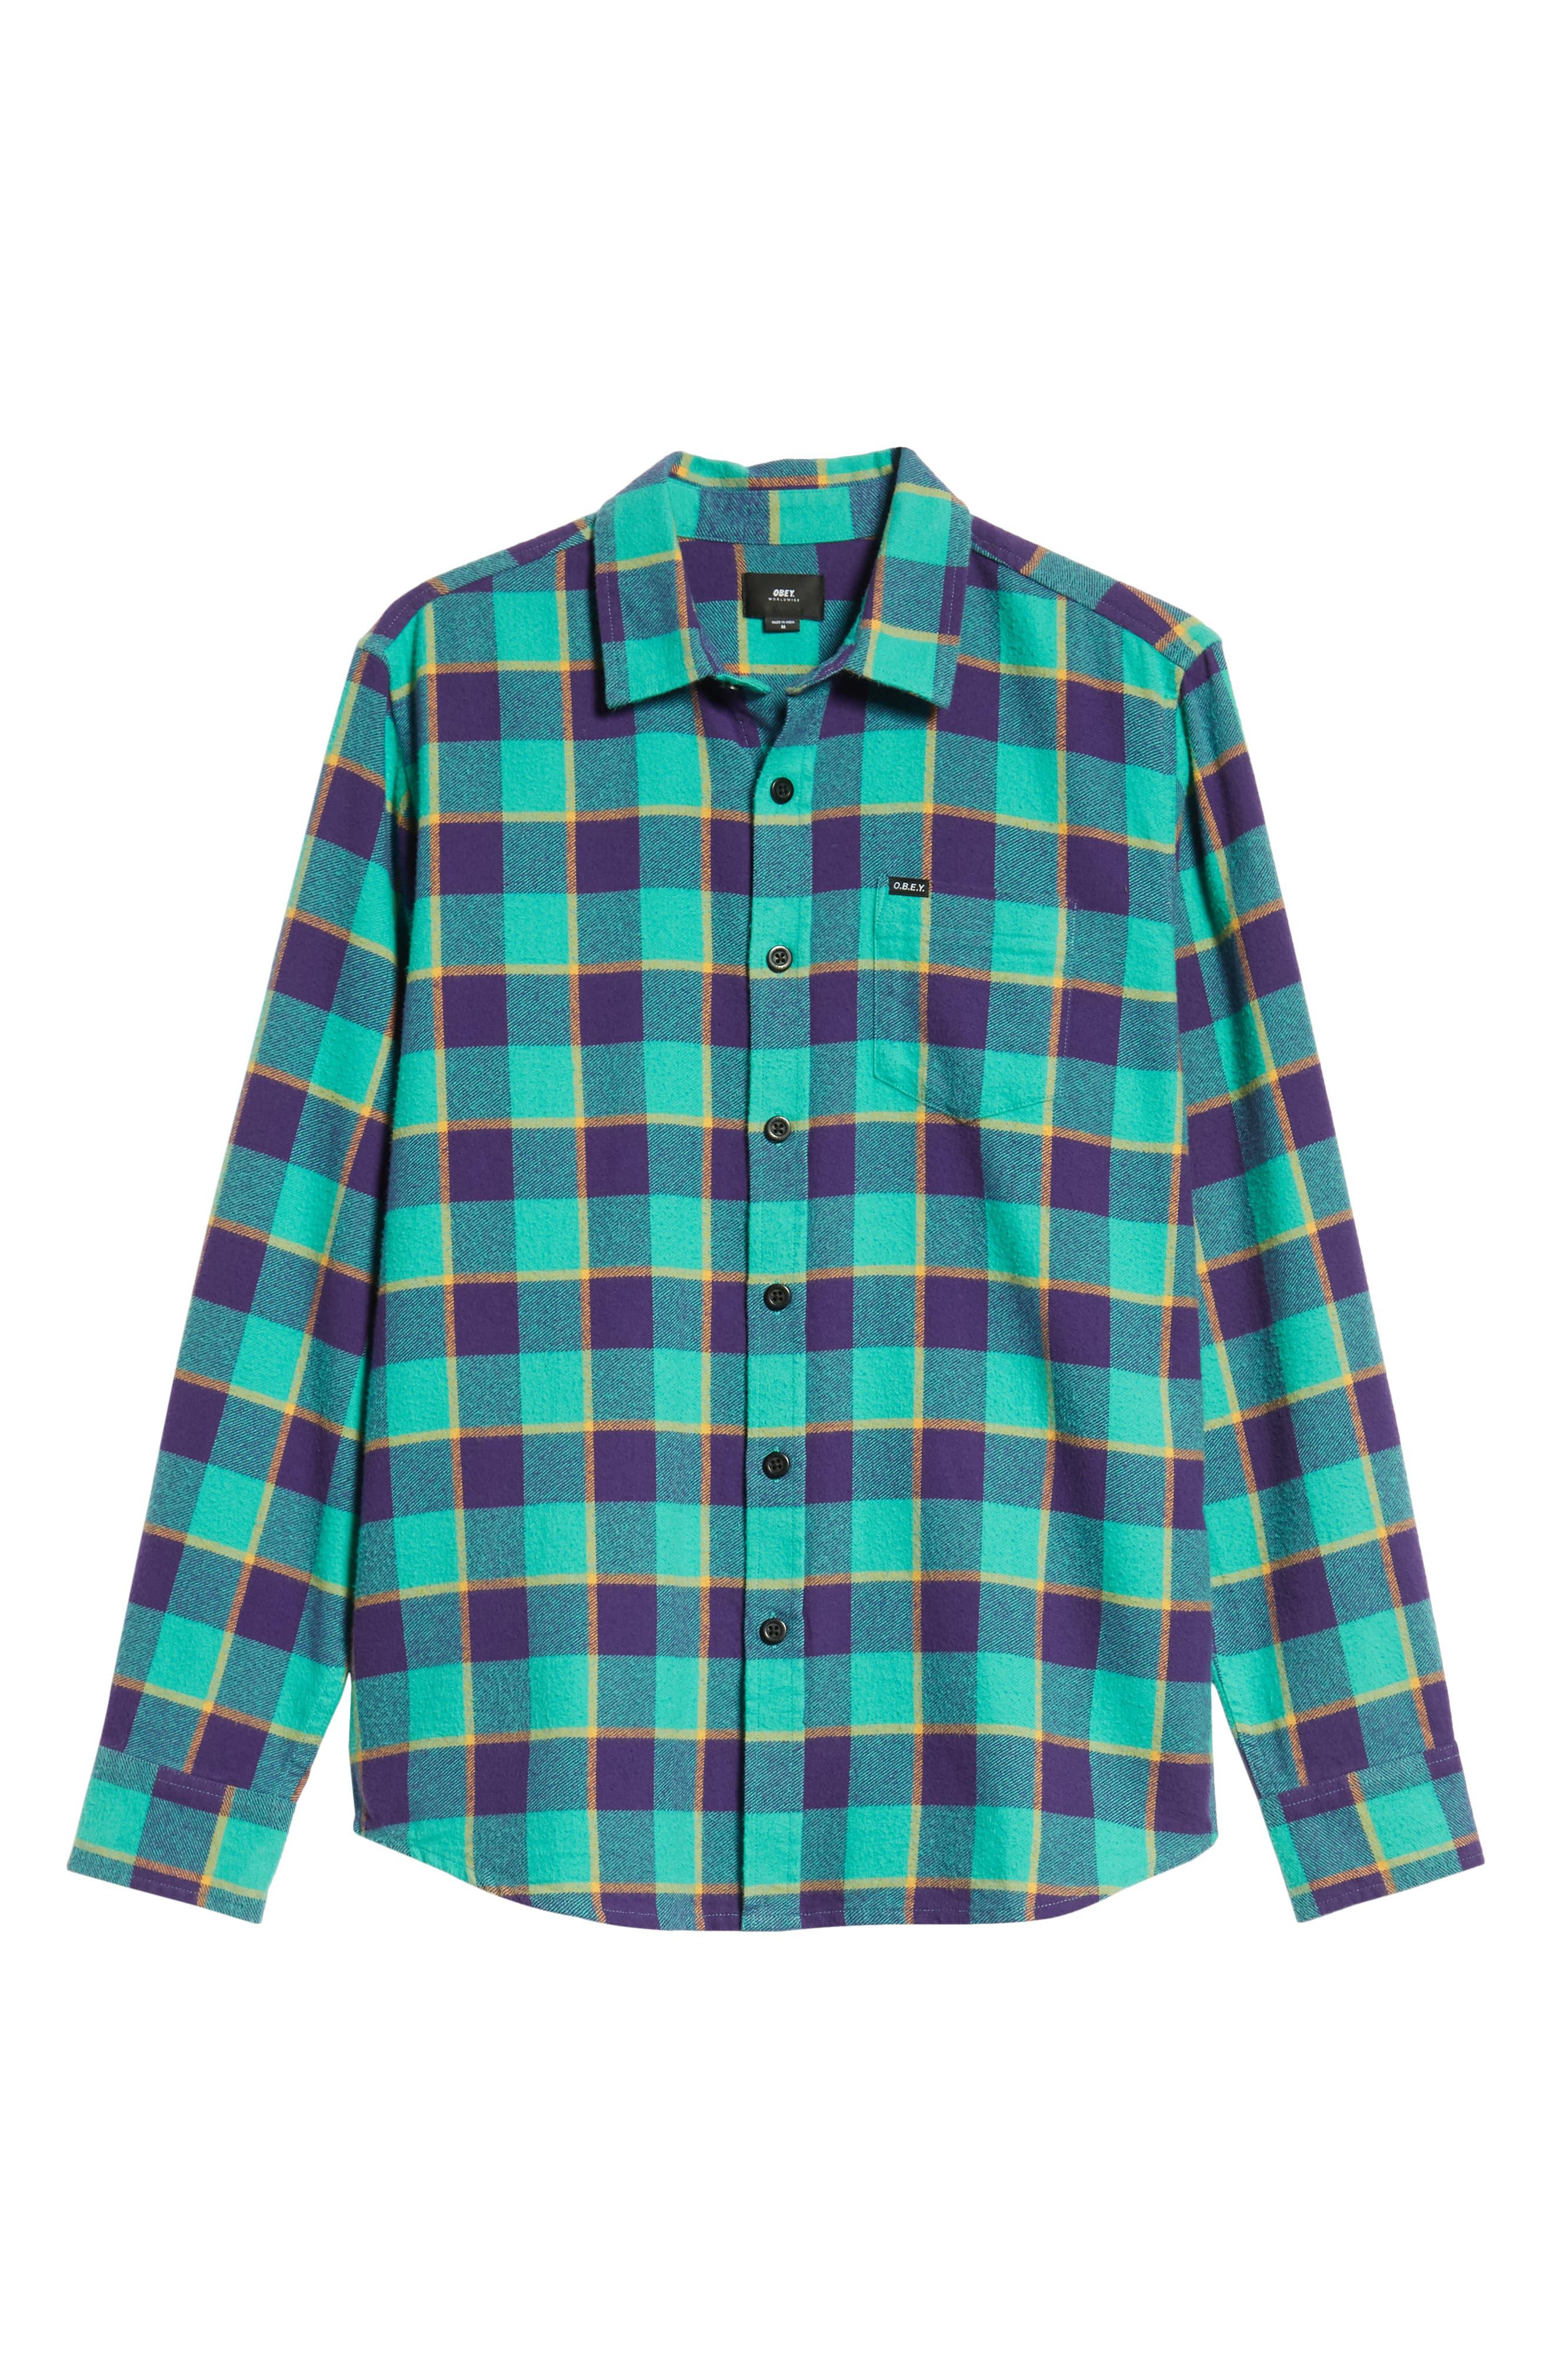 Ventura Plaid Flannel Shirt,                             Alternate thumbnail 5, color,                             TEAL MULTI